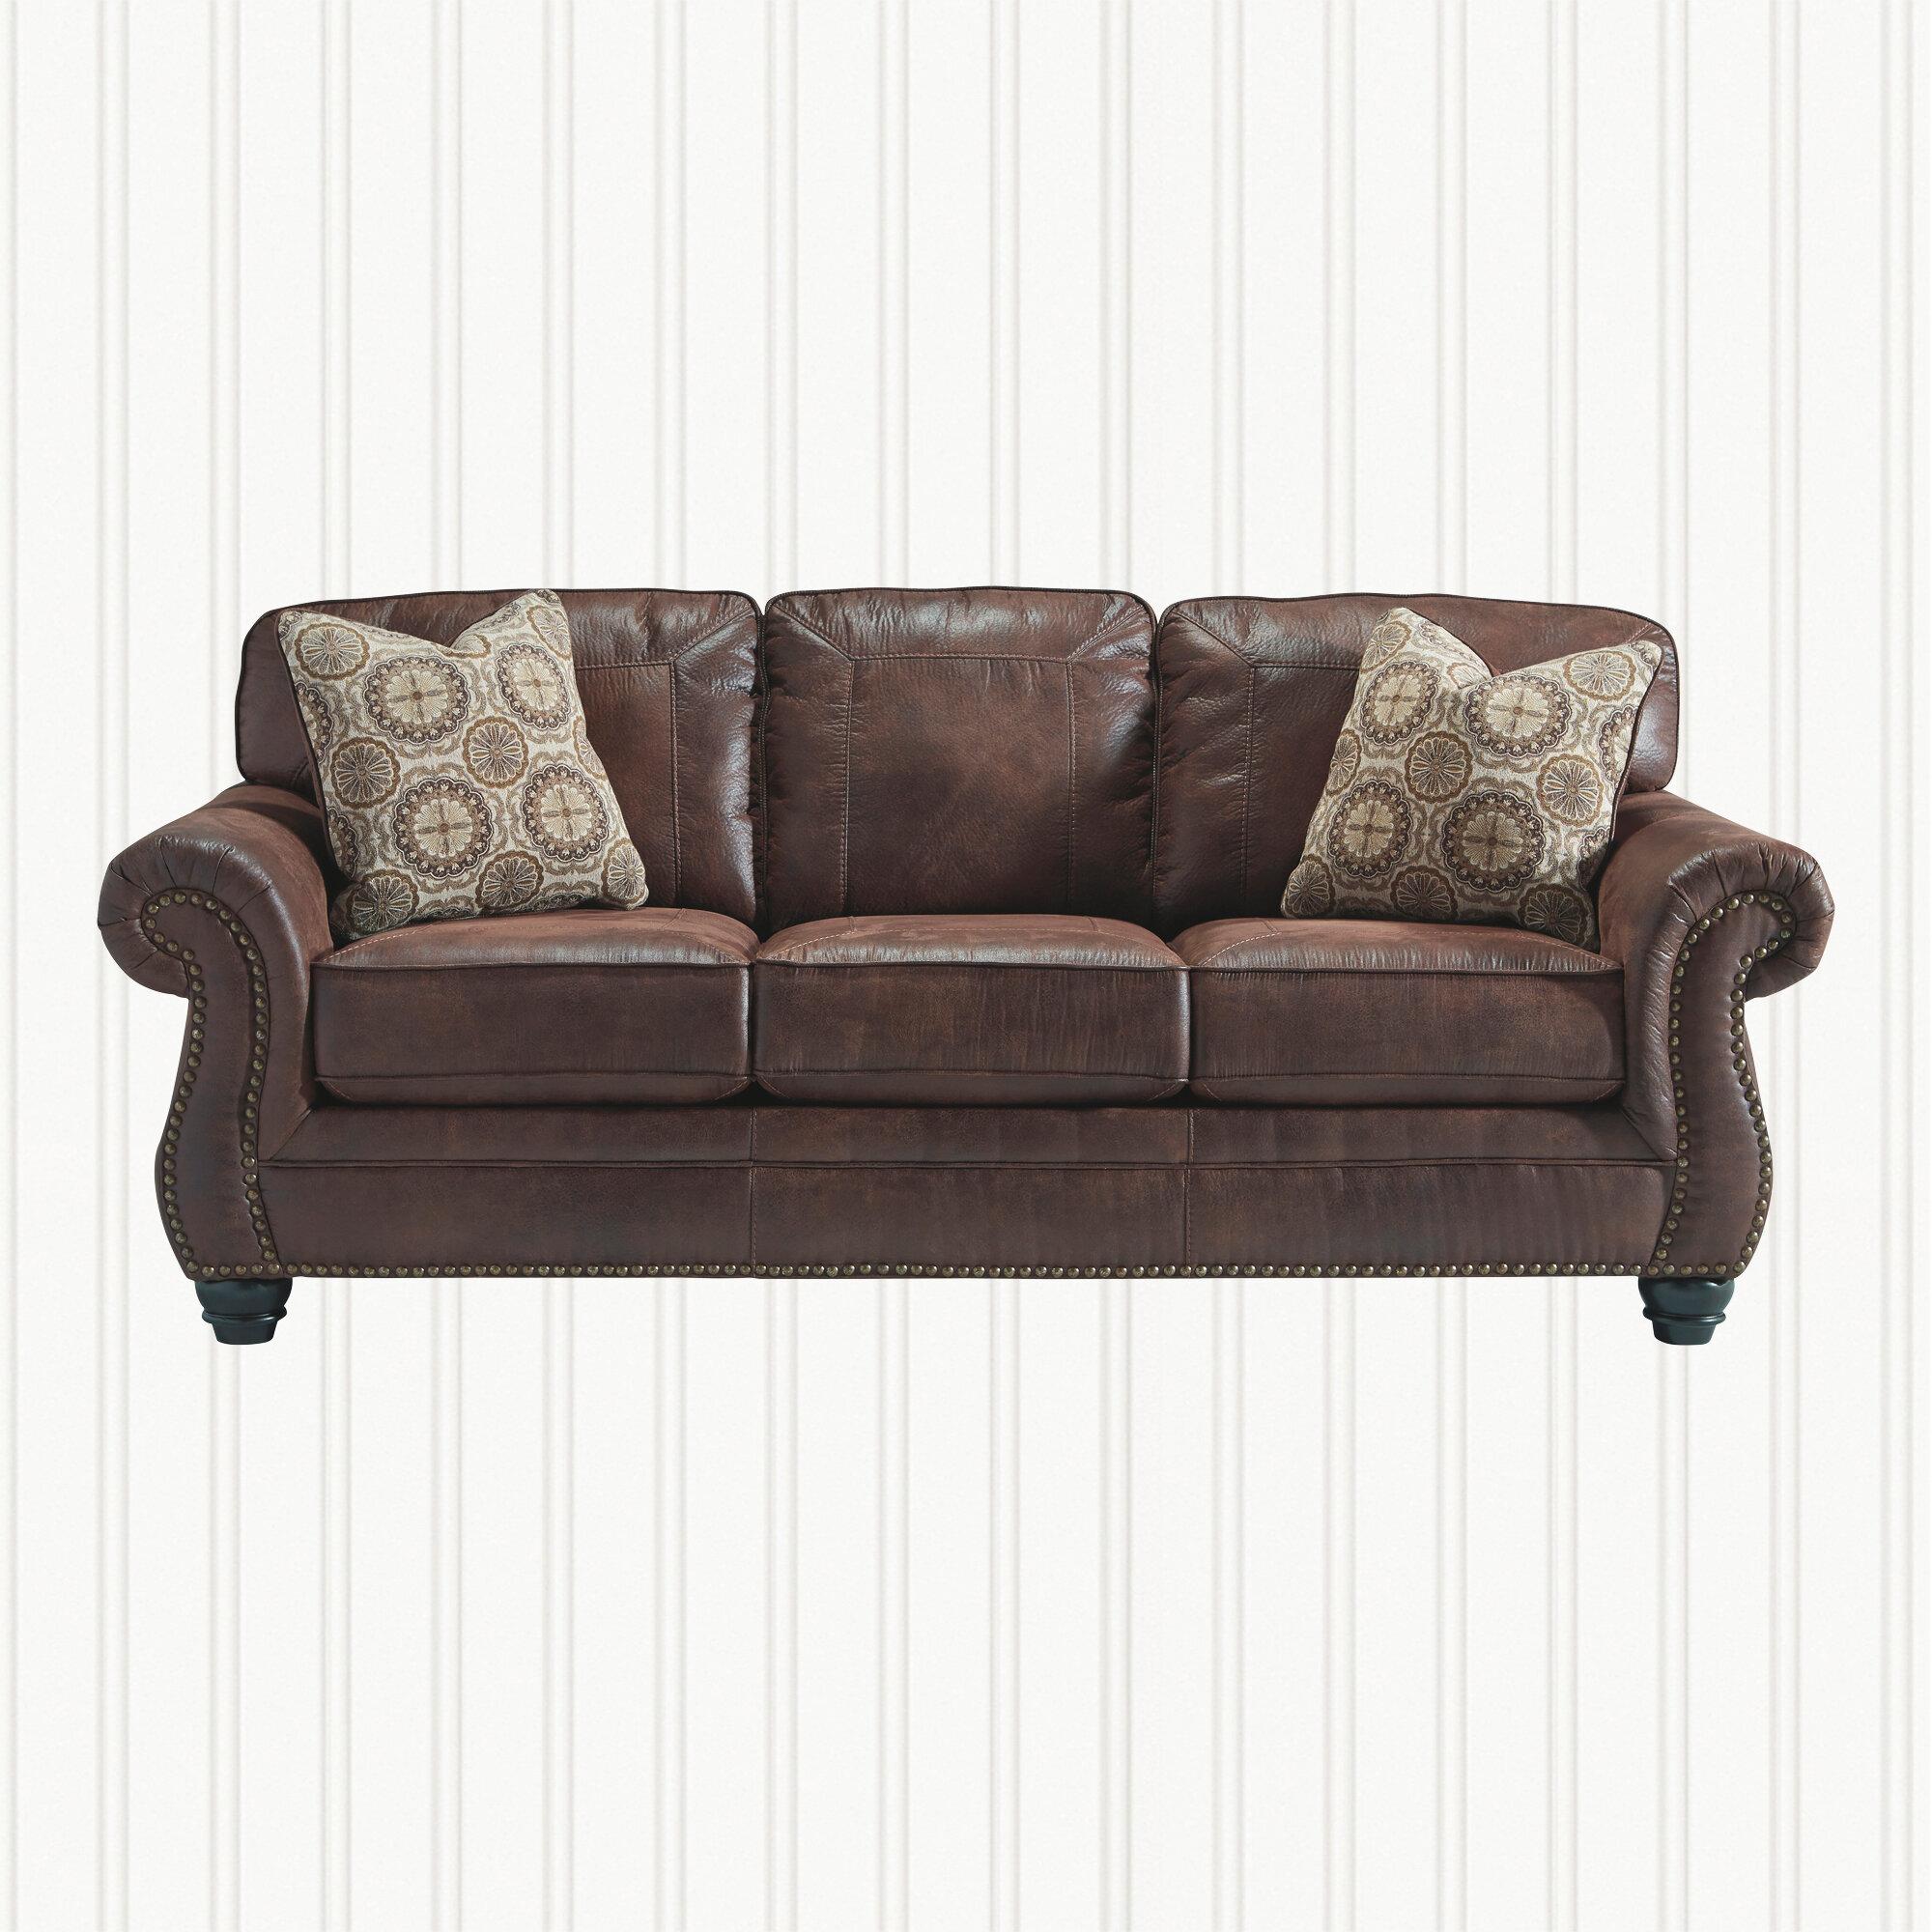 Charmant Conesville Queen Sleeper Sofa